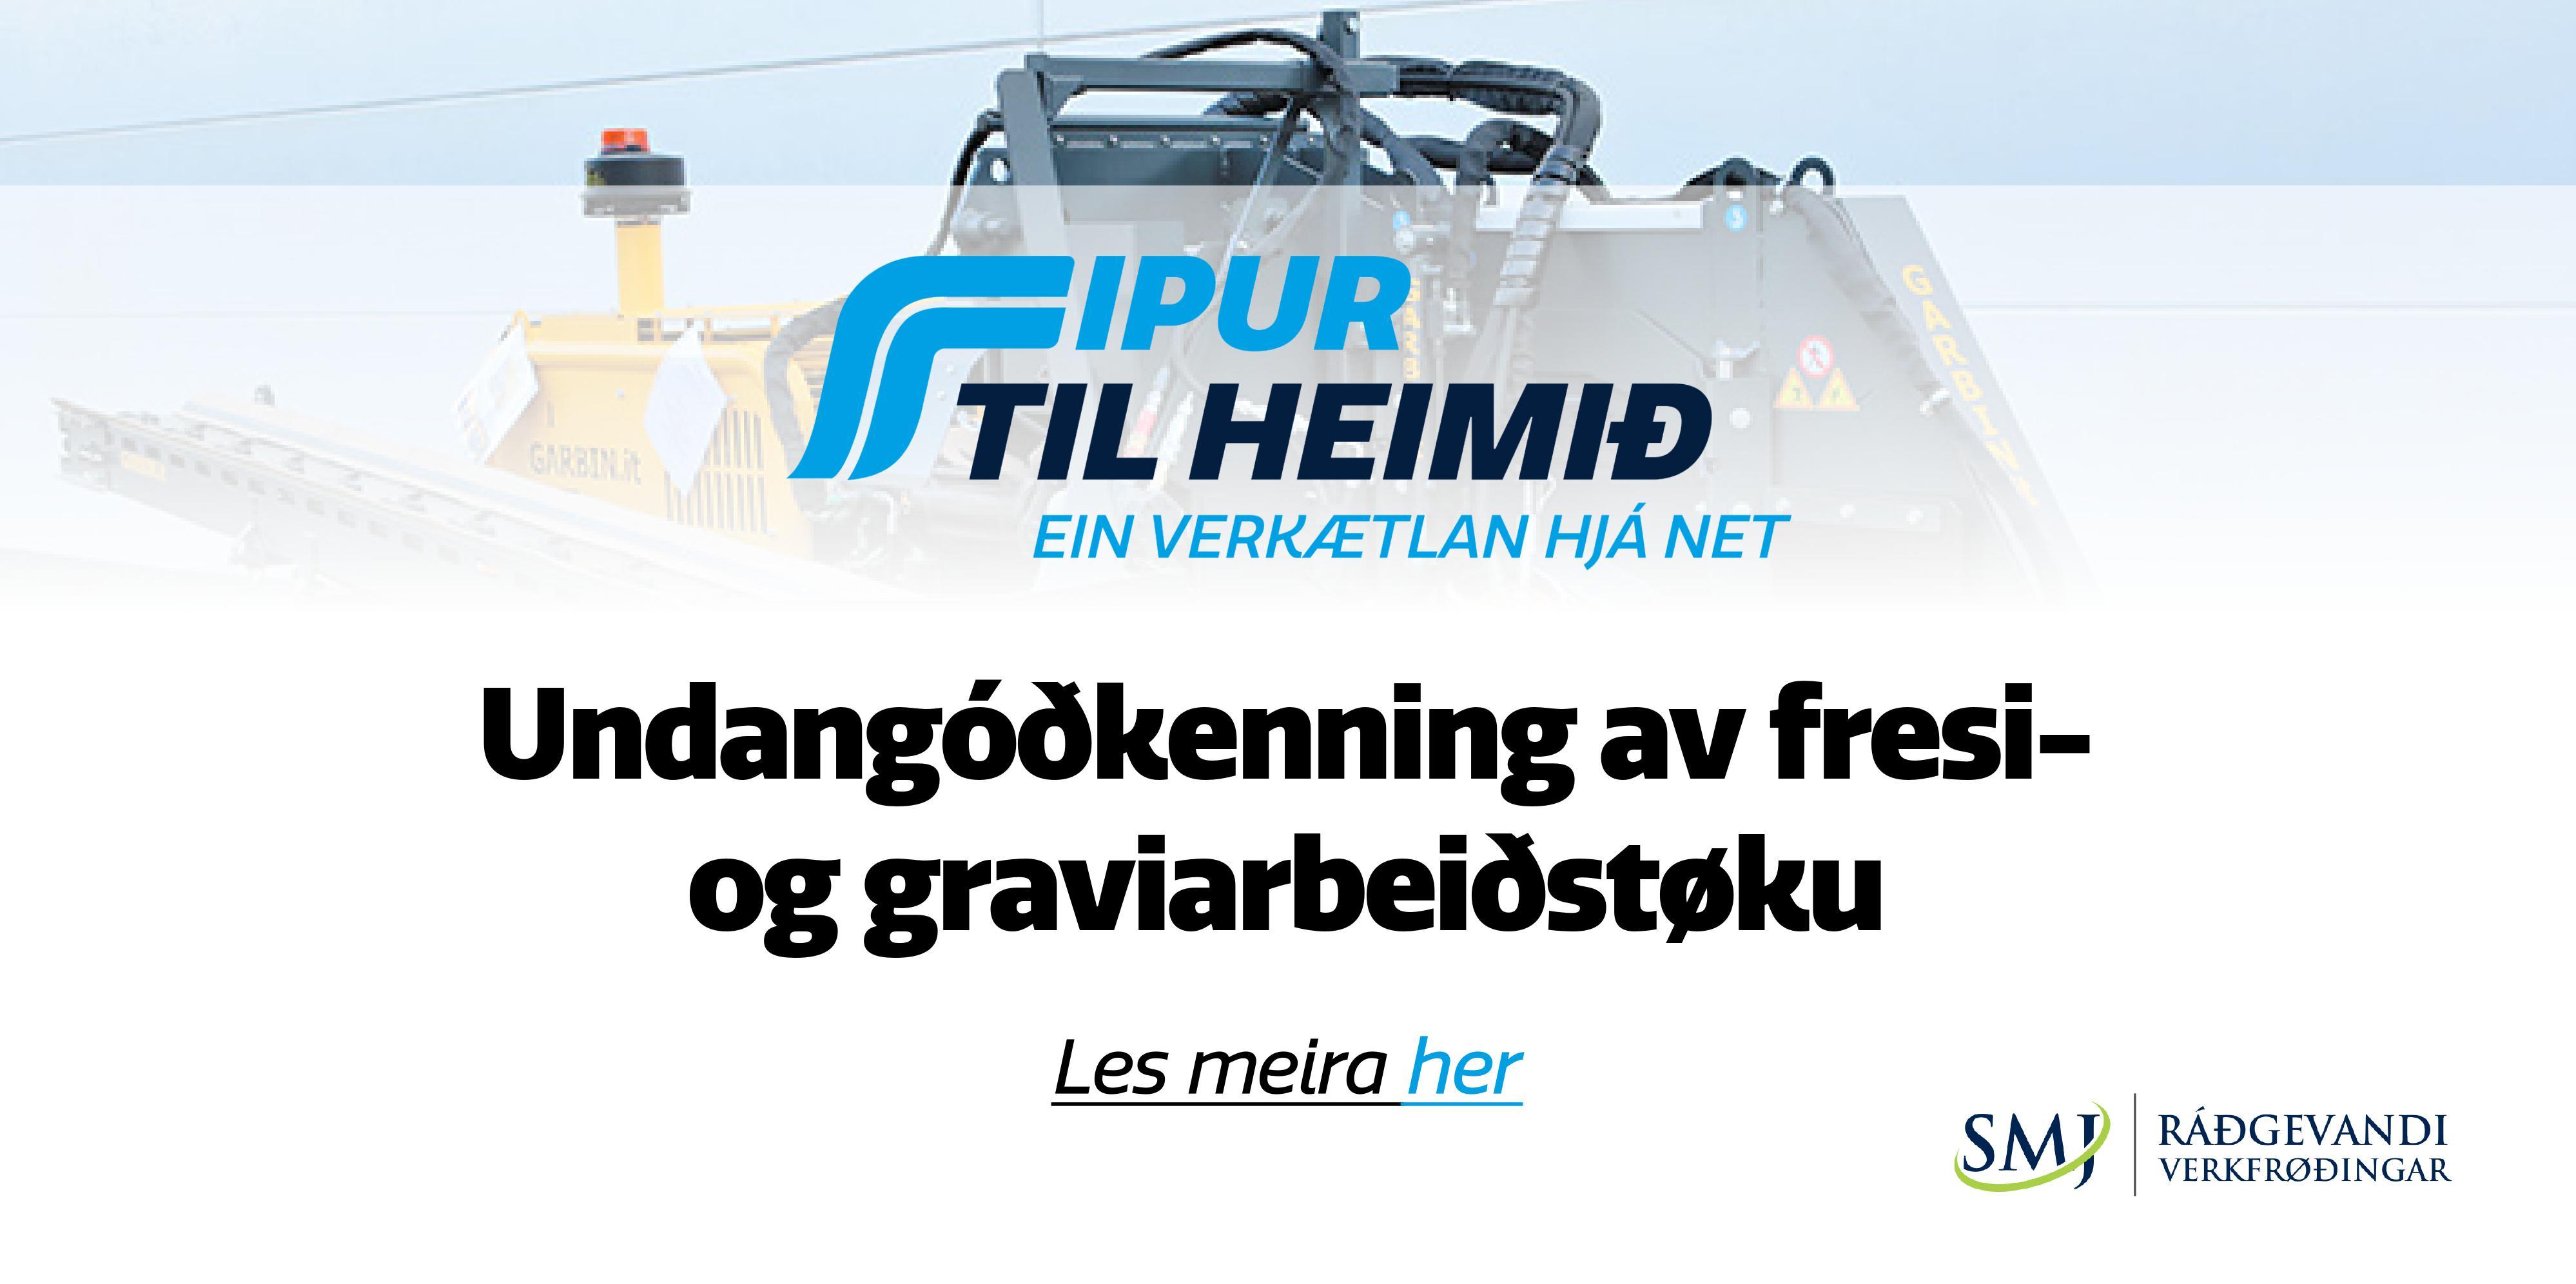 Fipur til heimið - smj